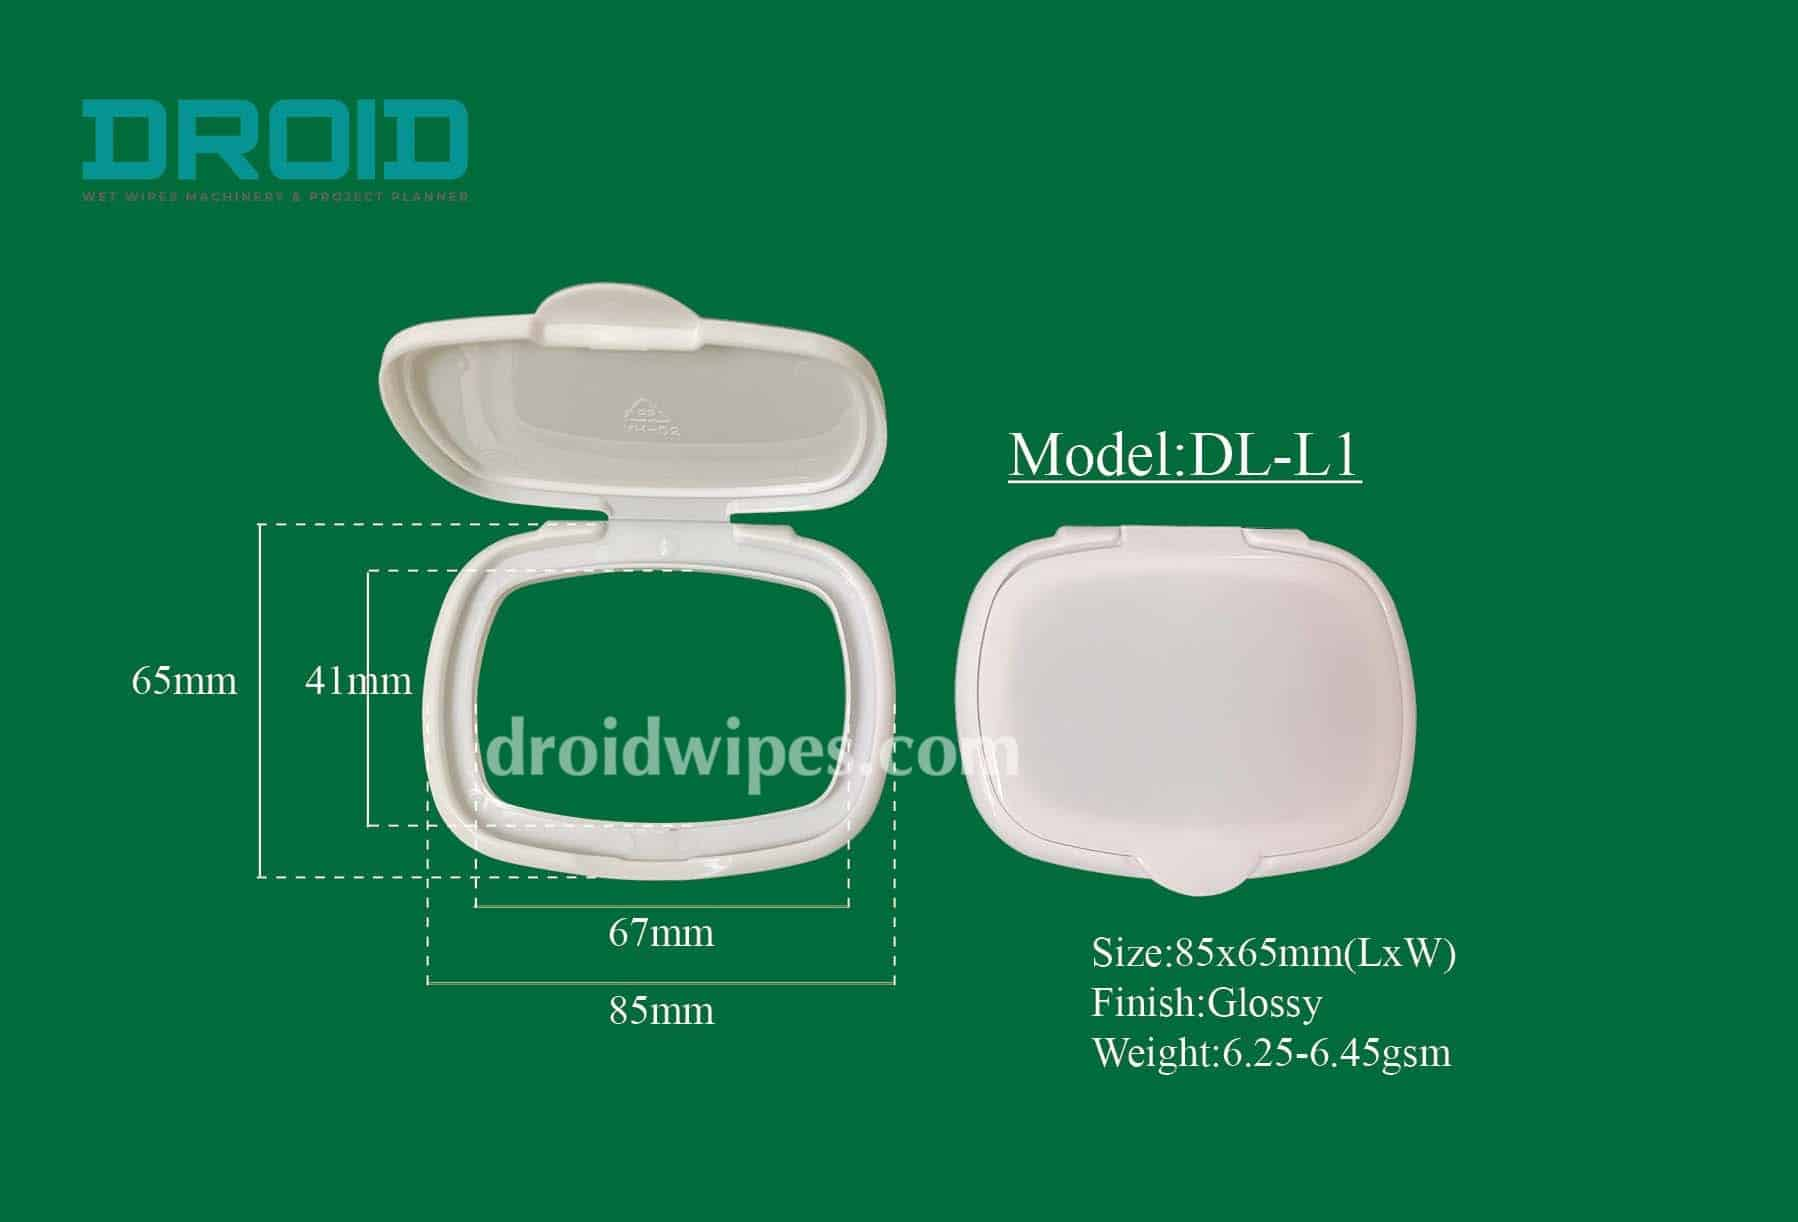 Plastic lid for wet wipes 10 - Plastic Lid for Wet Wipes